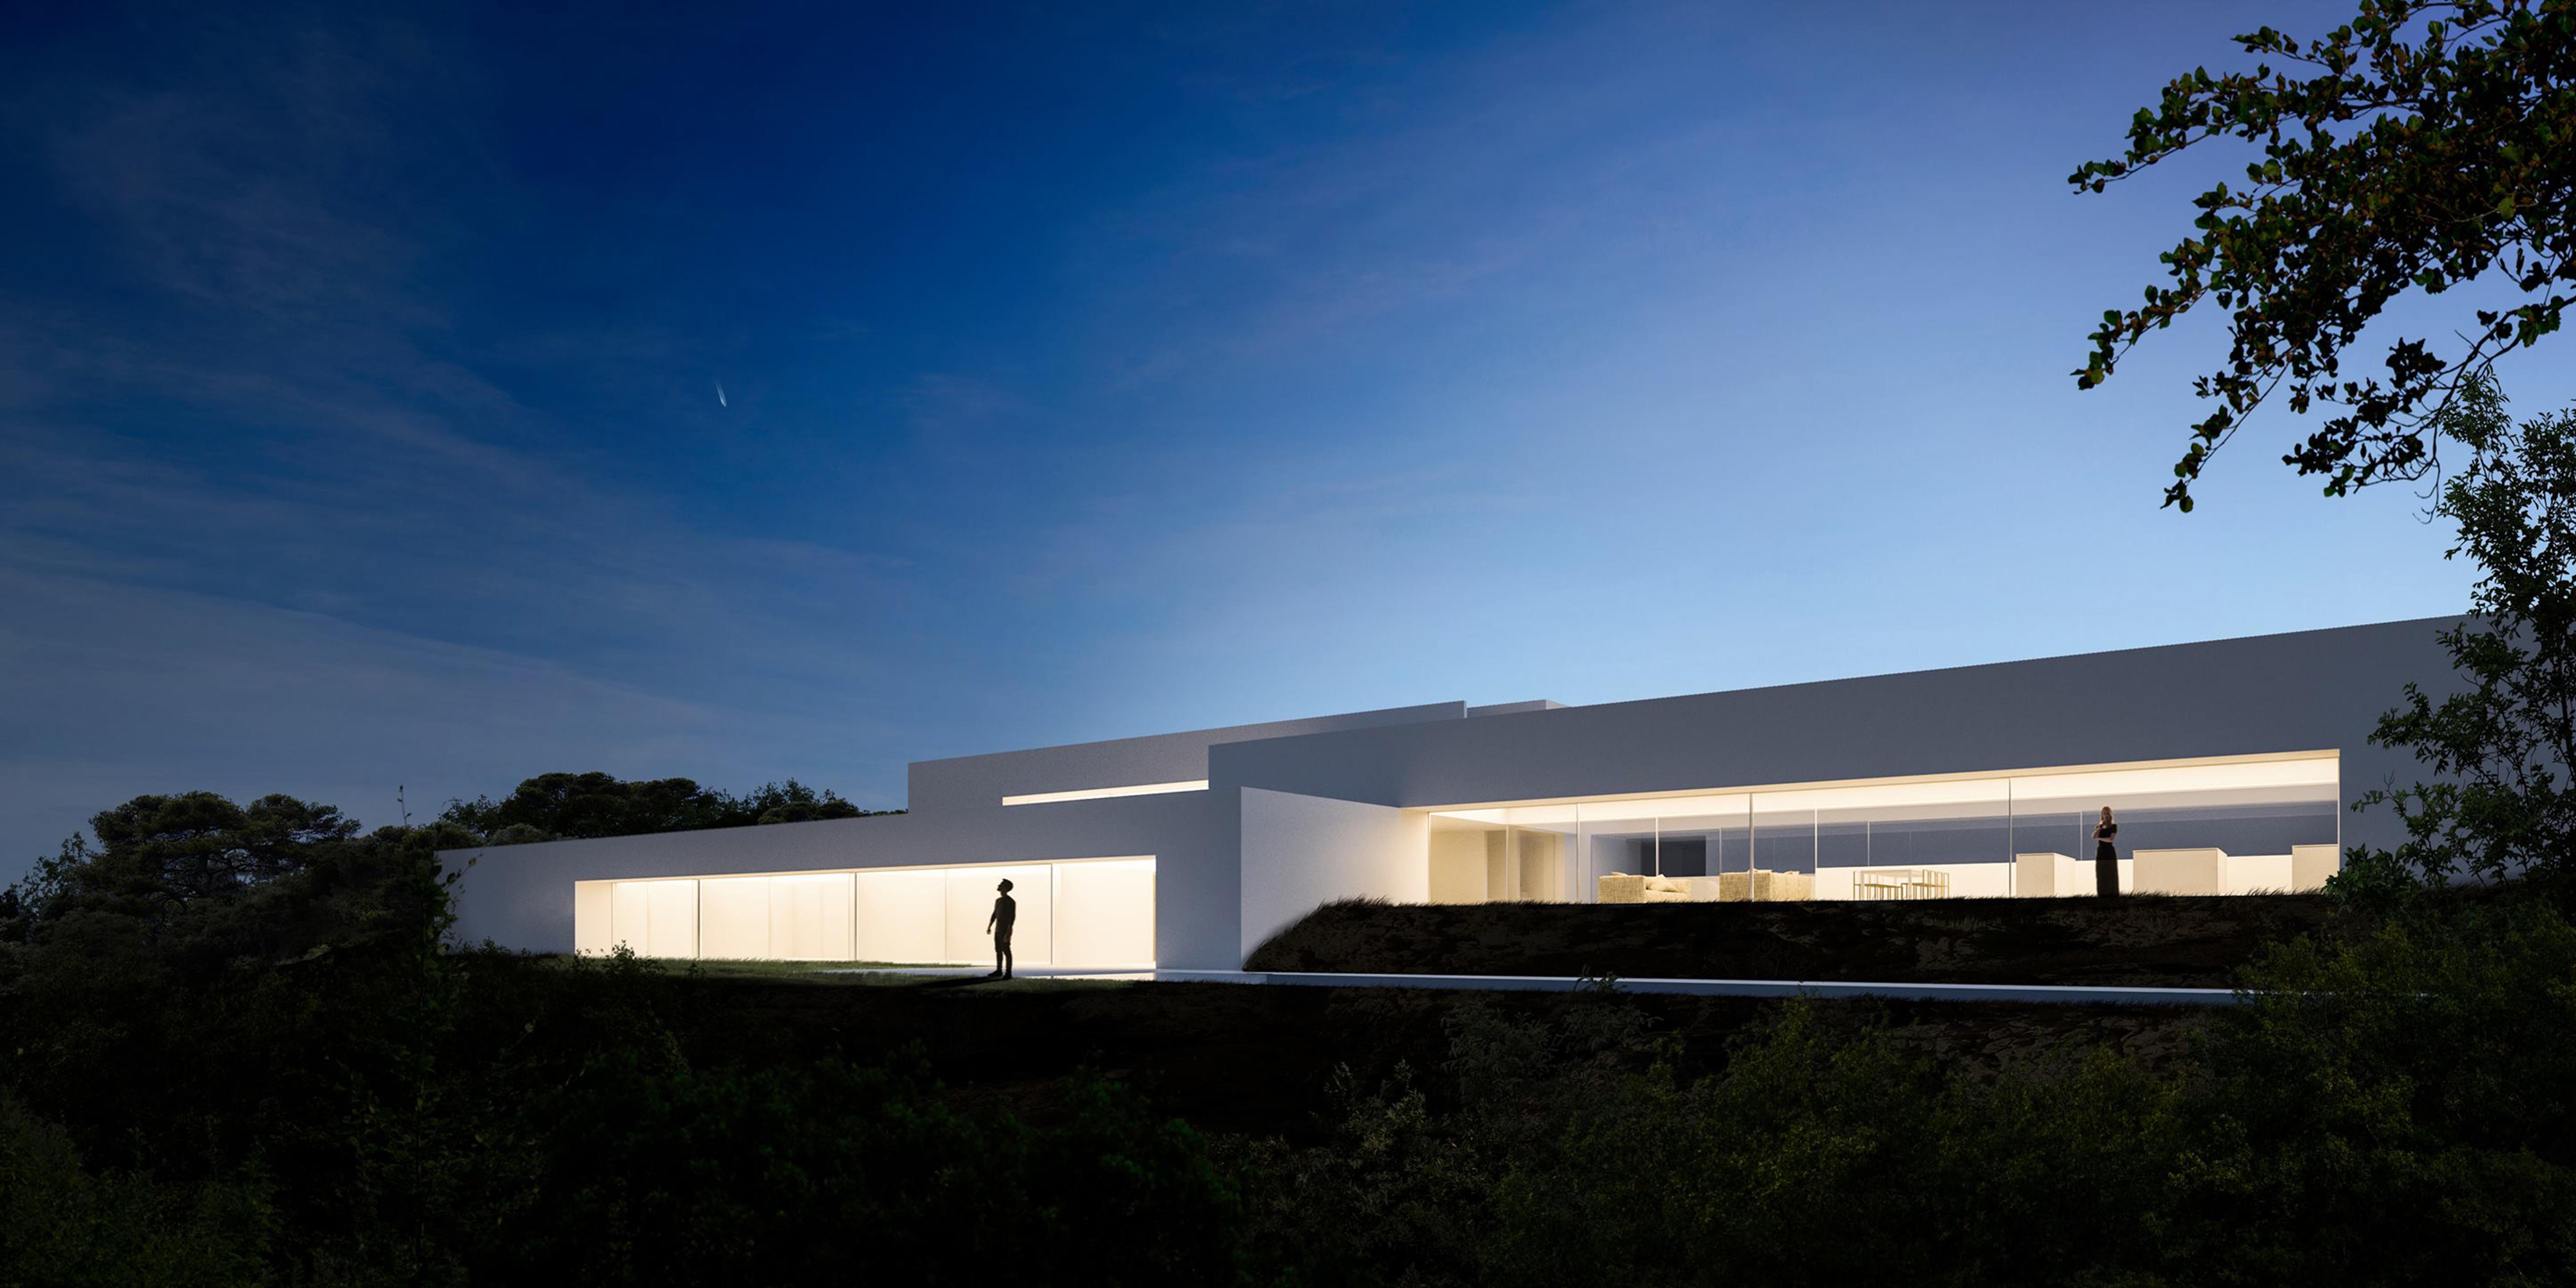 Casa Zarid - Fran Silvestre Arquitectos - Noticia